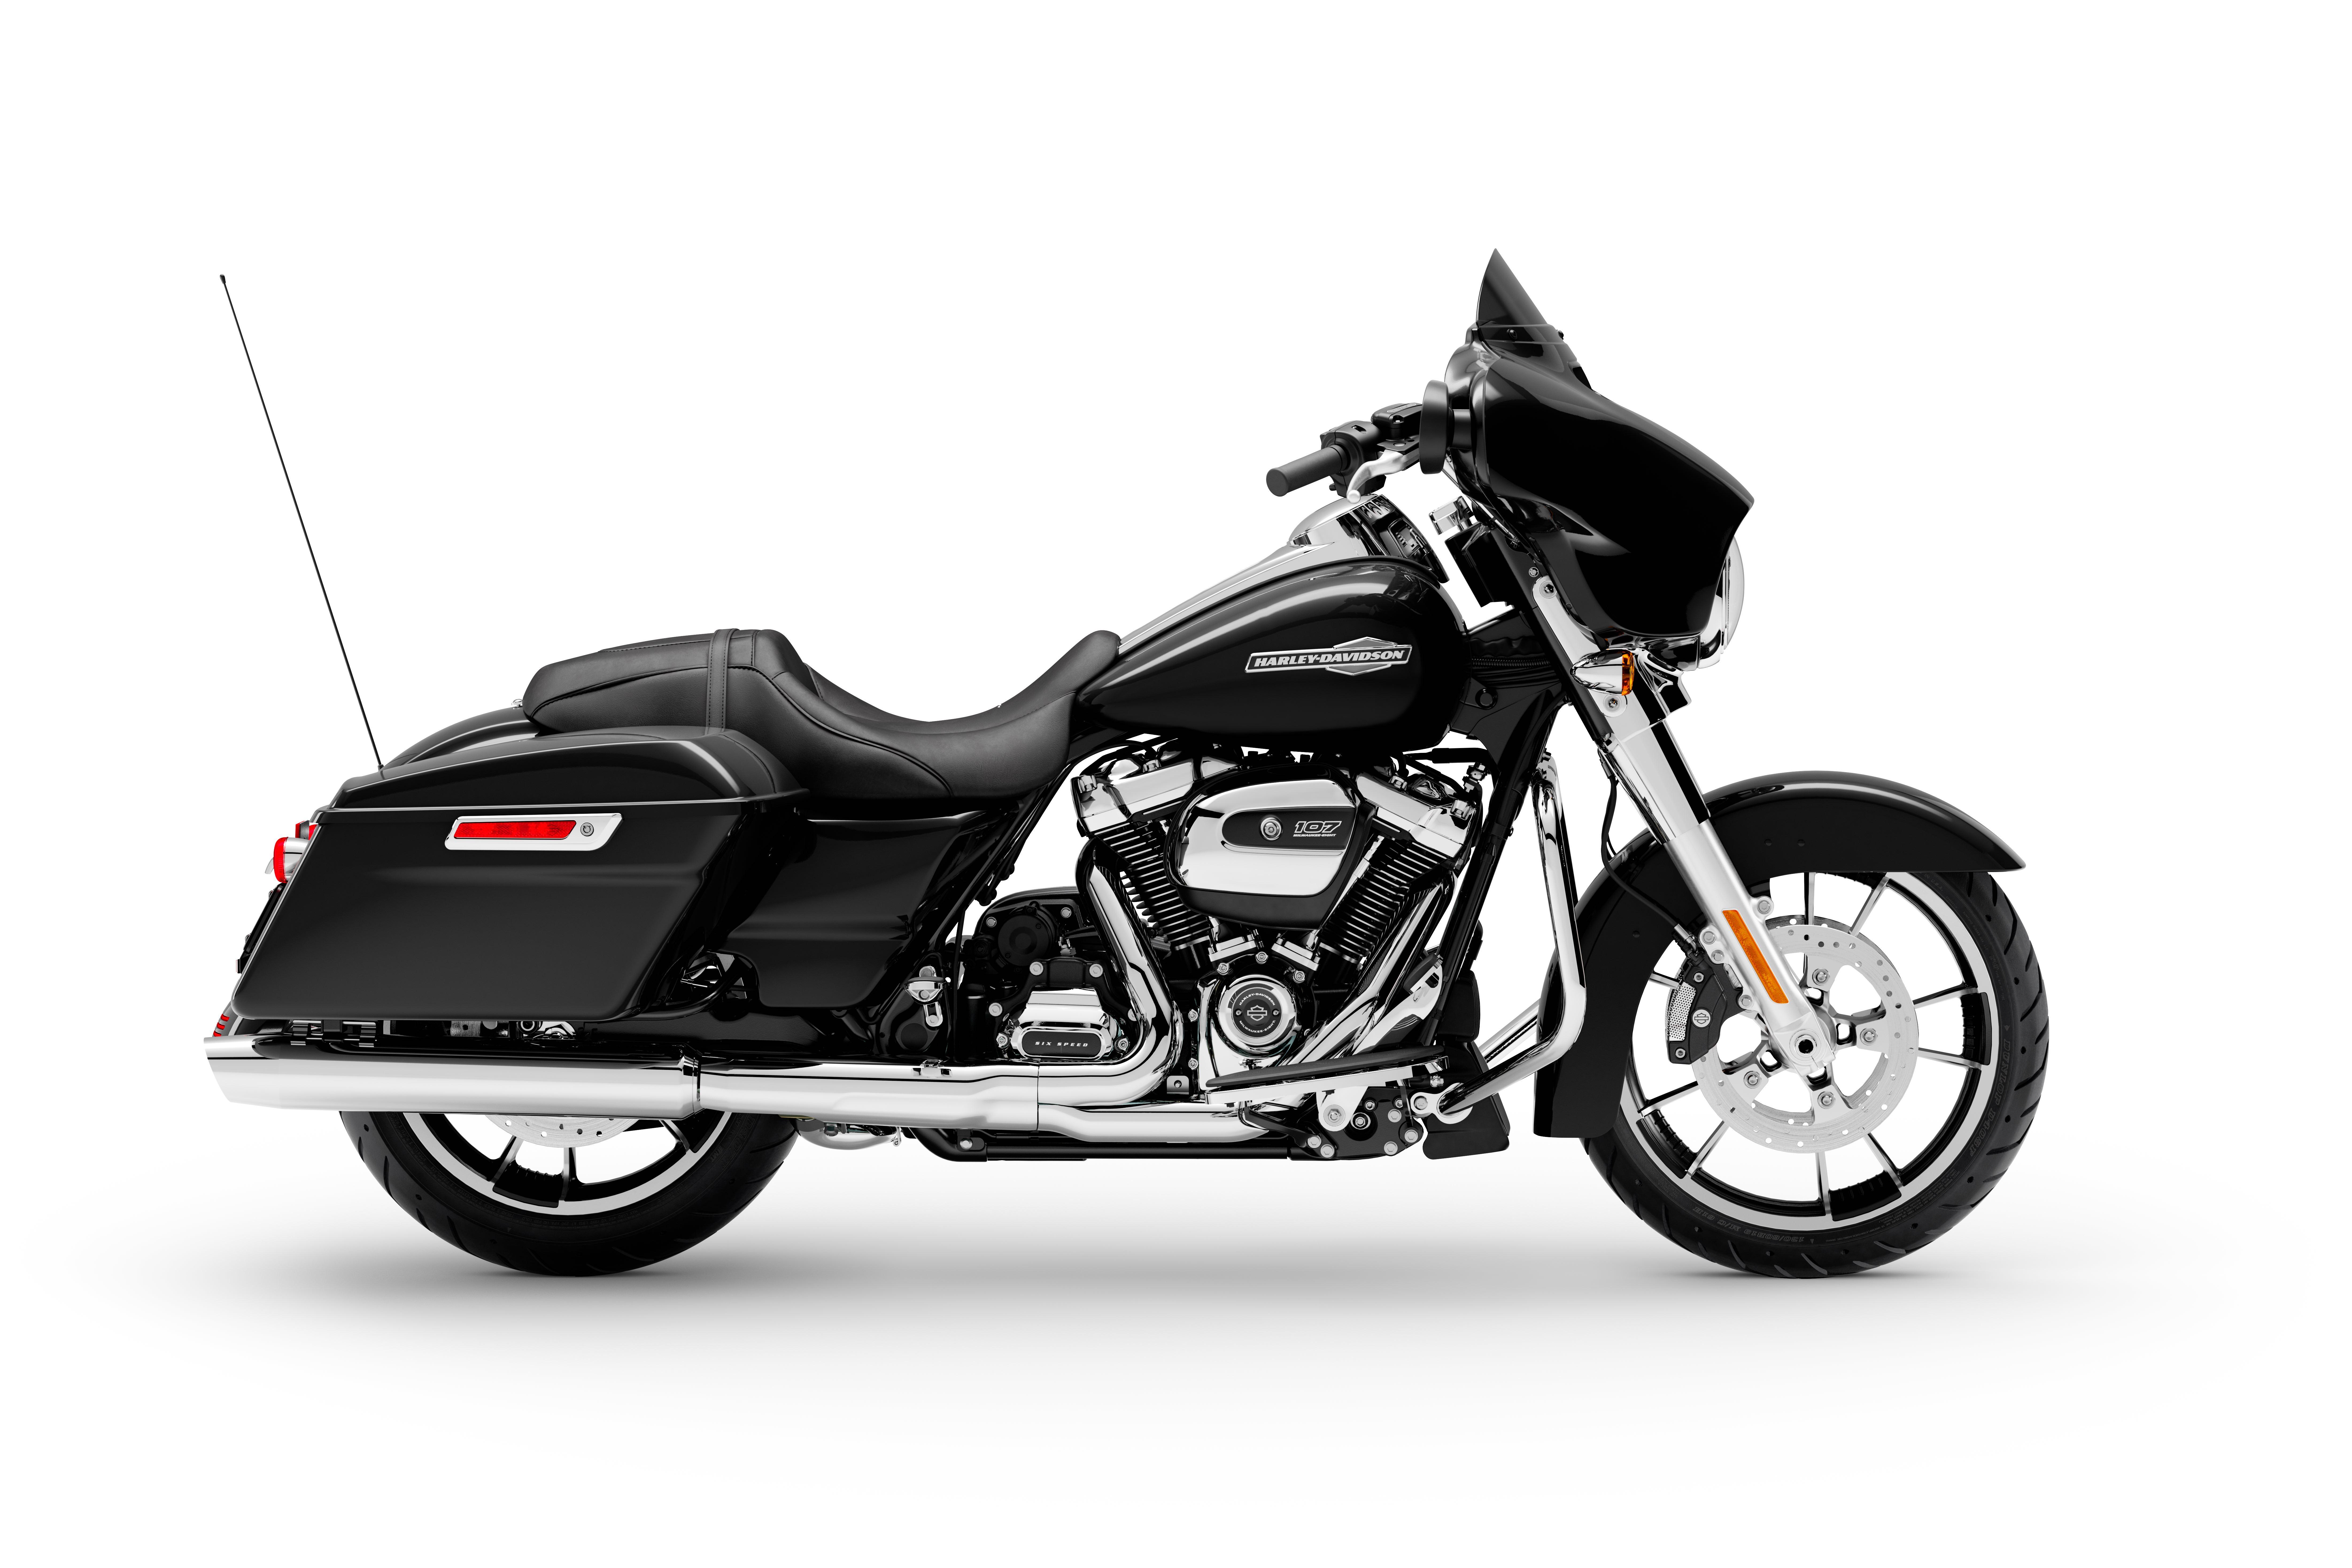 2021 Harley-Davidson Street Glide [11]